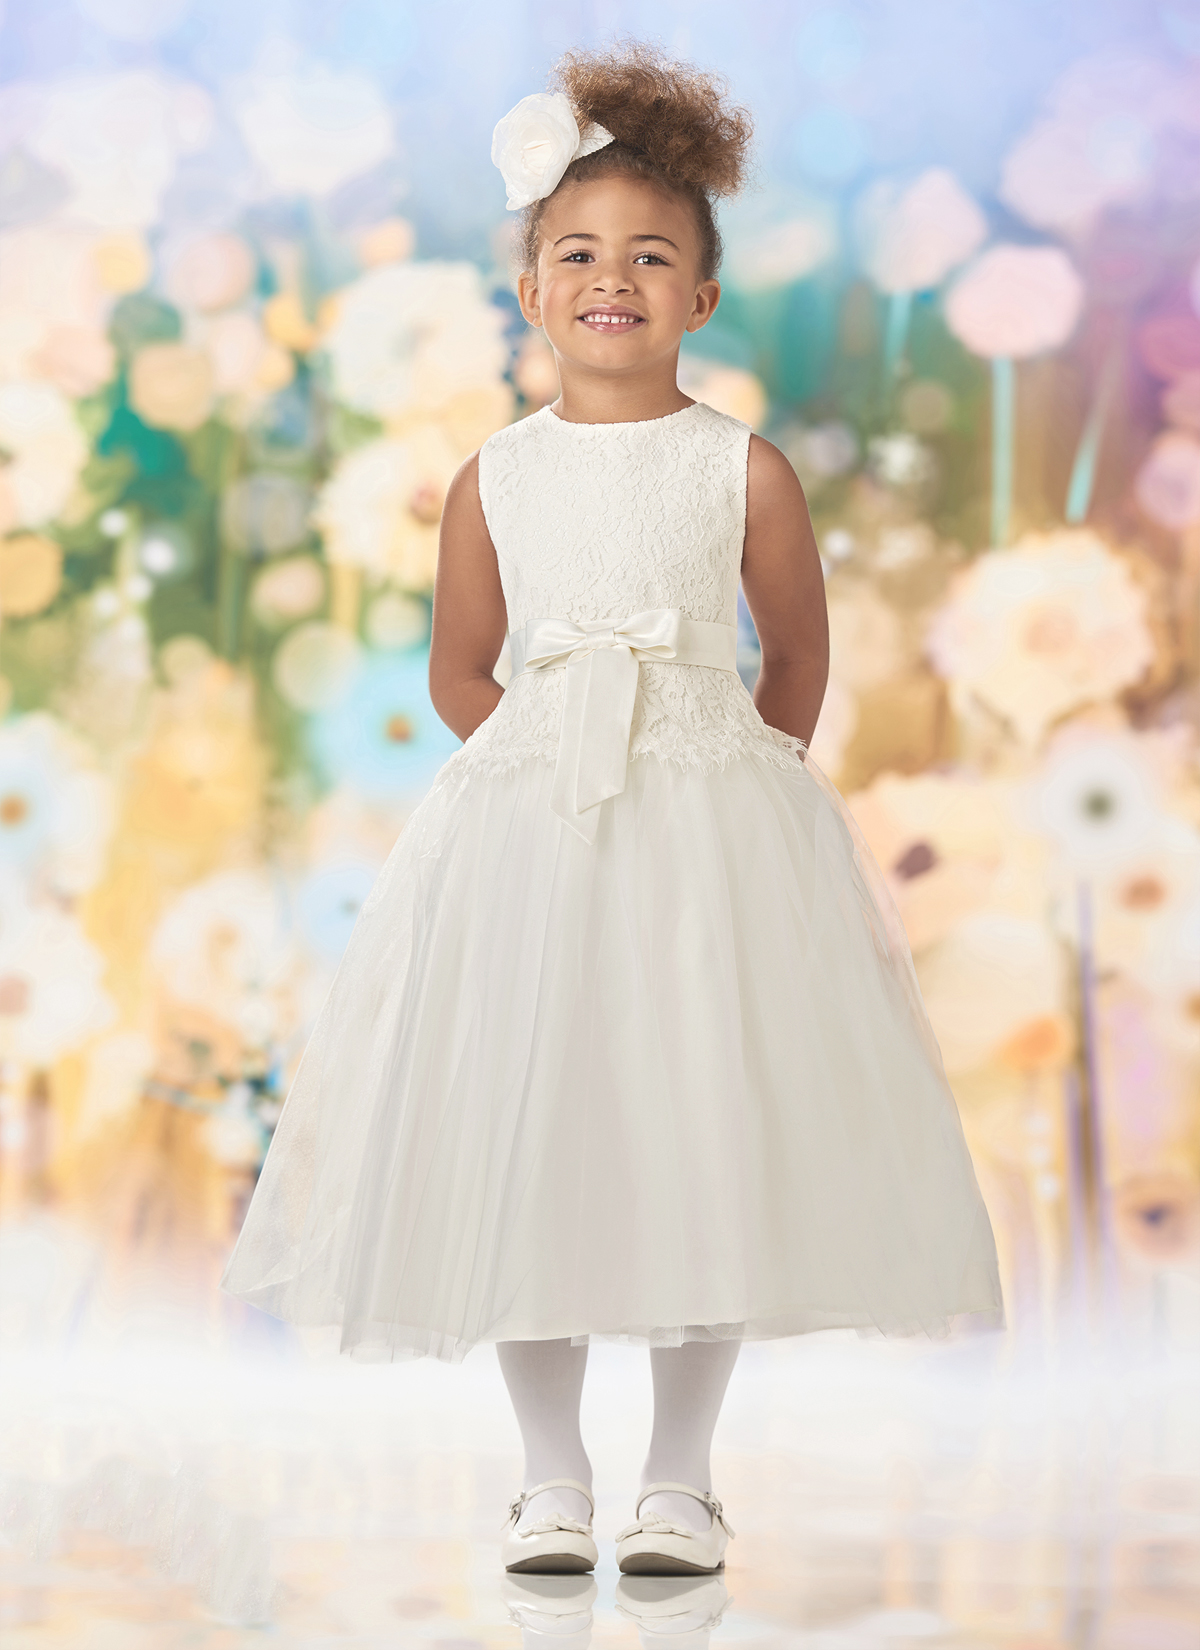 a410b2240cb Boho Flower Girl Dresses Melbourne - Gomes Weine AG